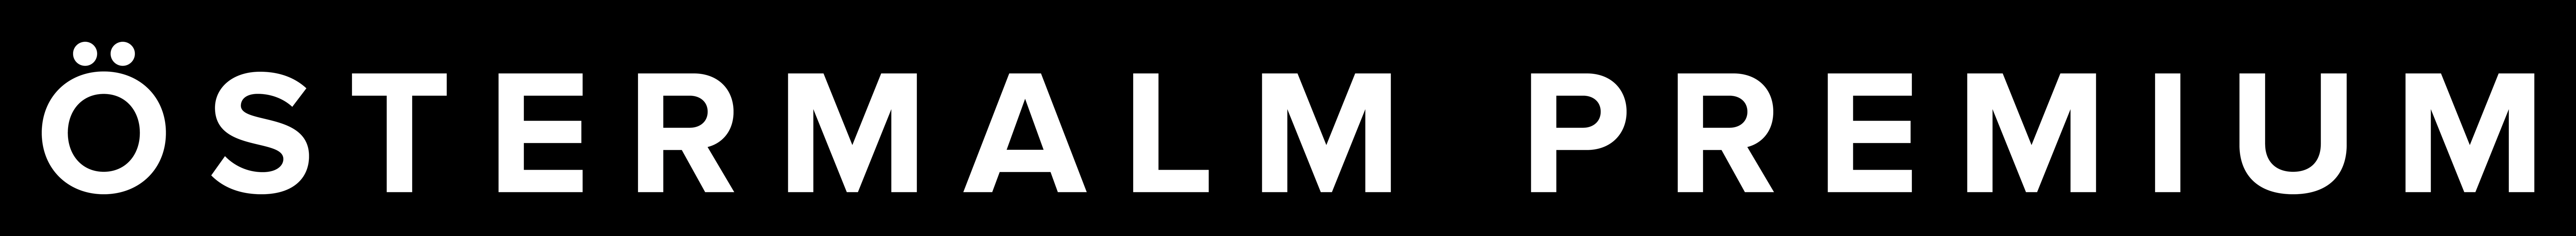 Logo Östermalm Premium - @ostermalm - ostermalm.com